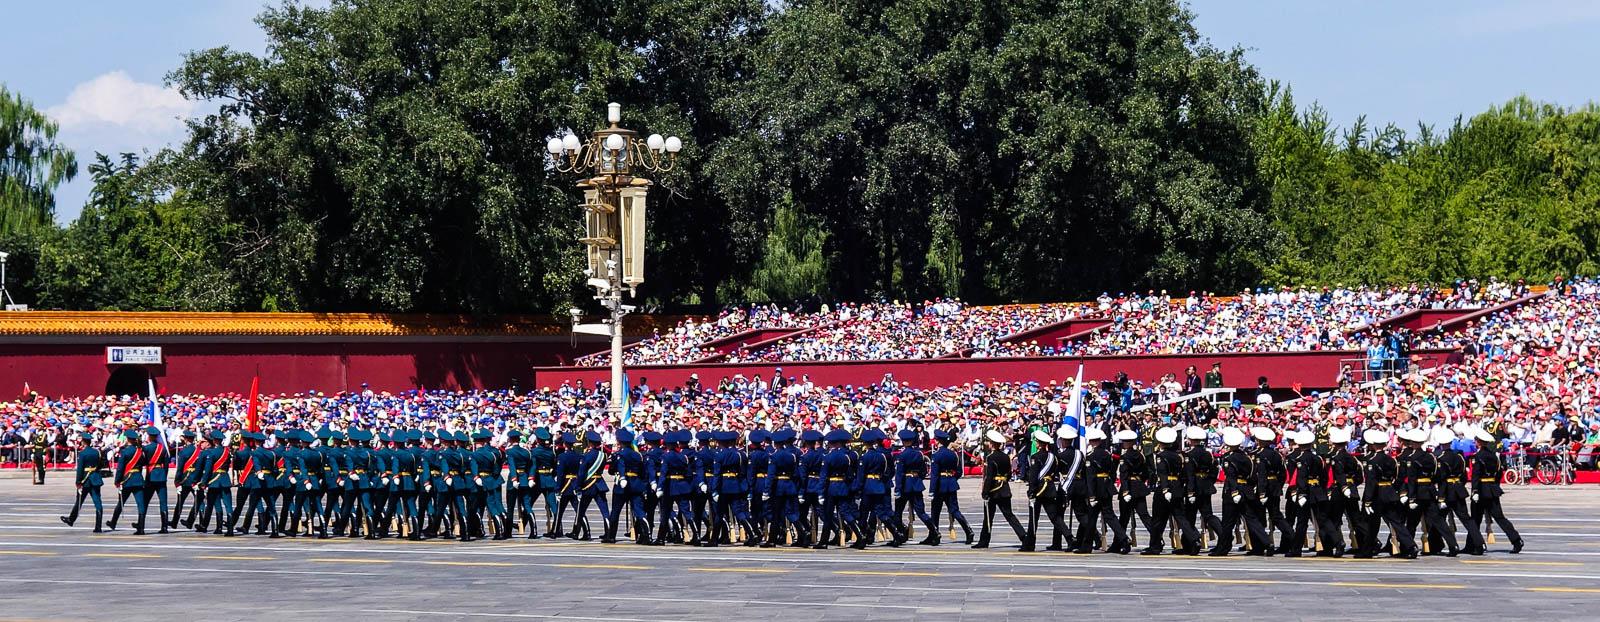 beijing-china-military-parade-2015-27